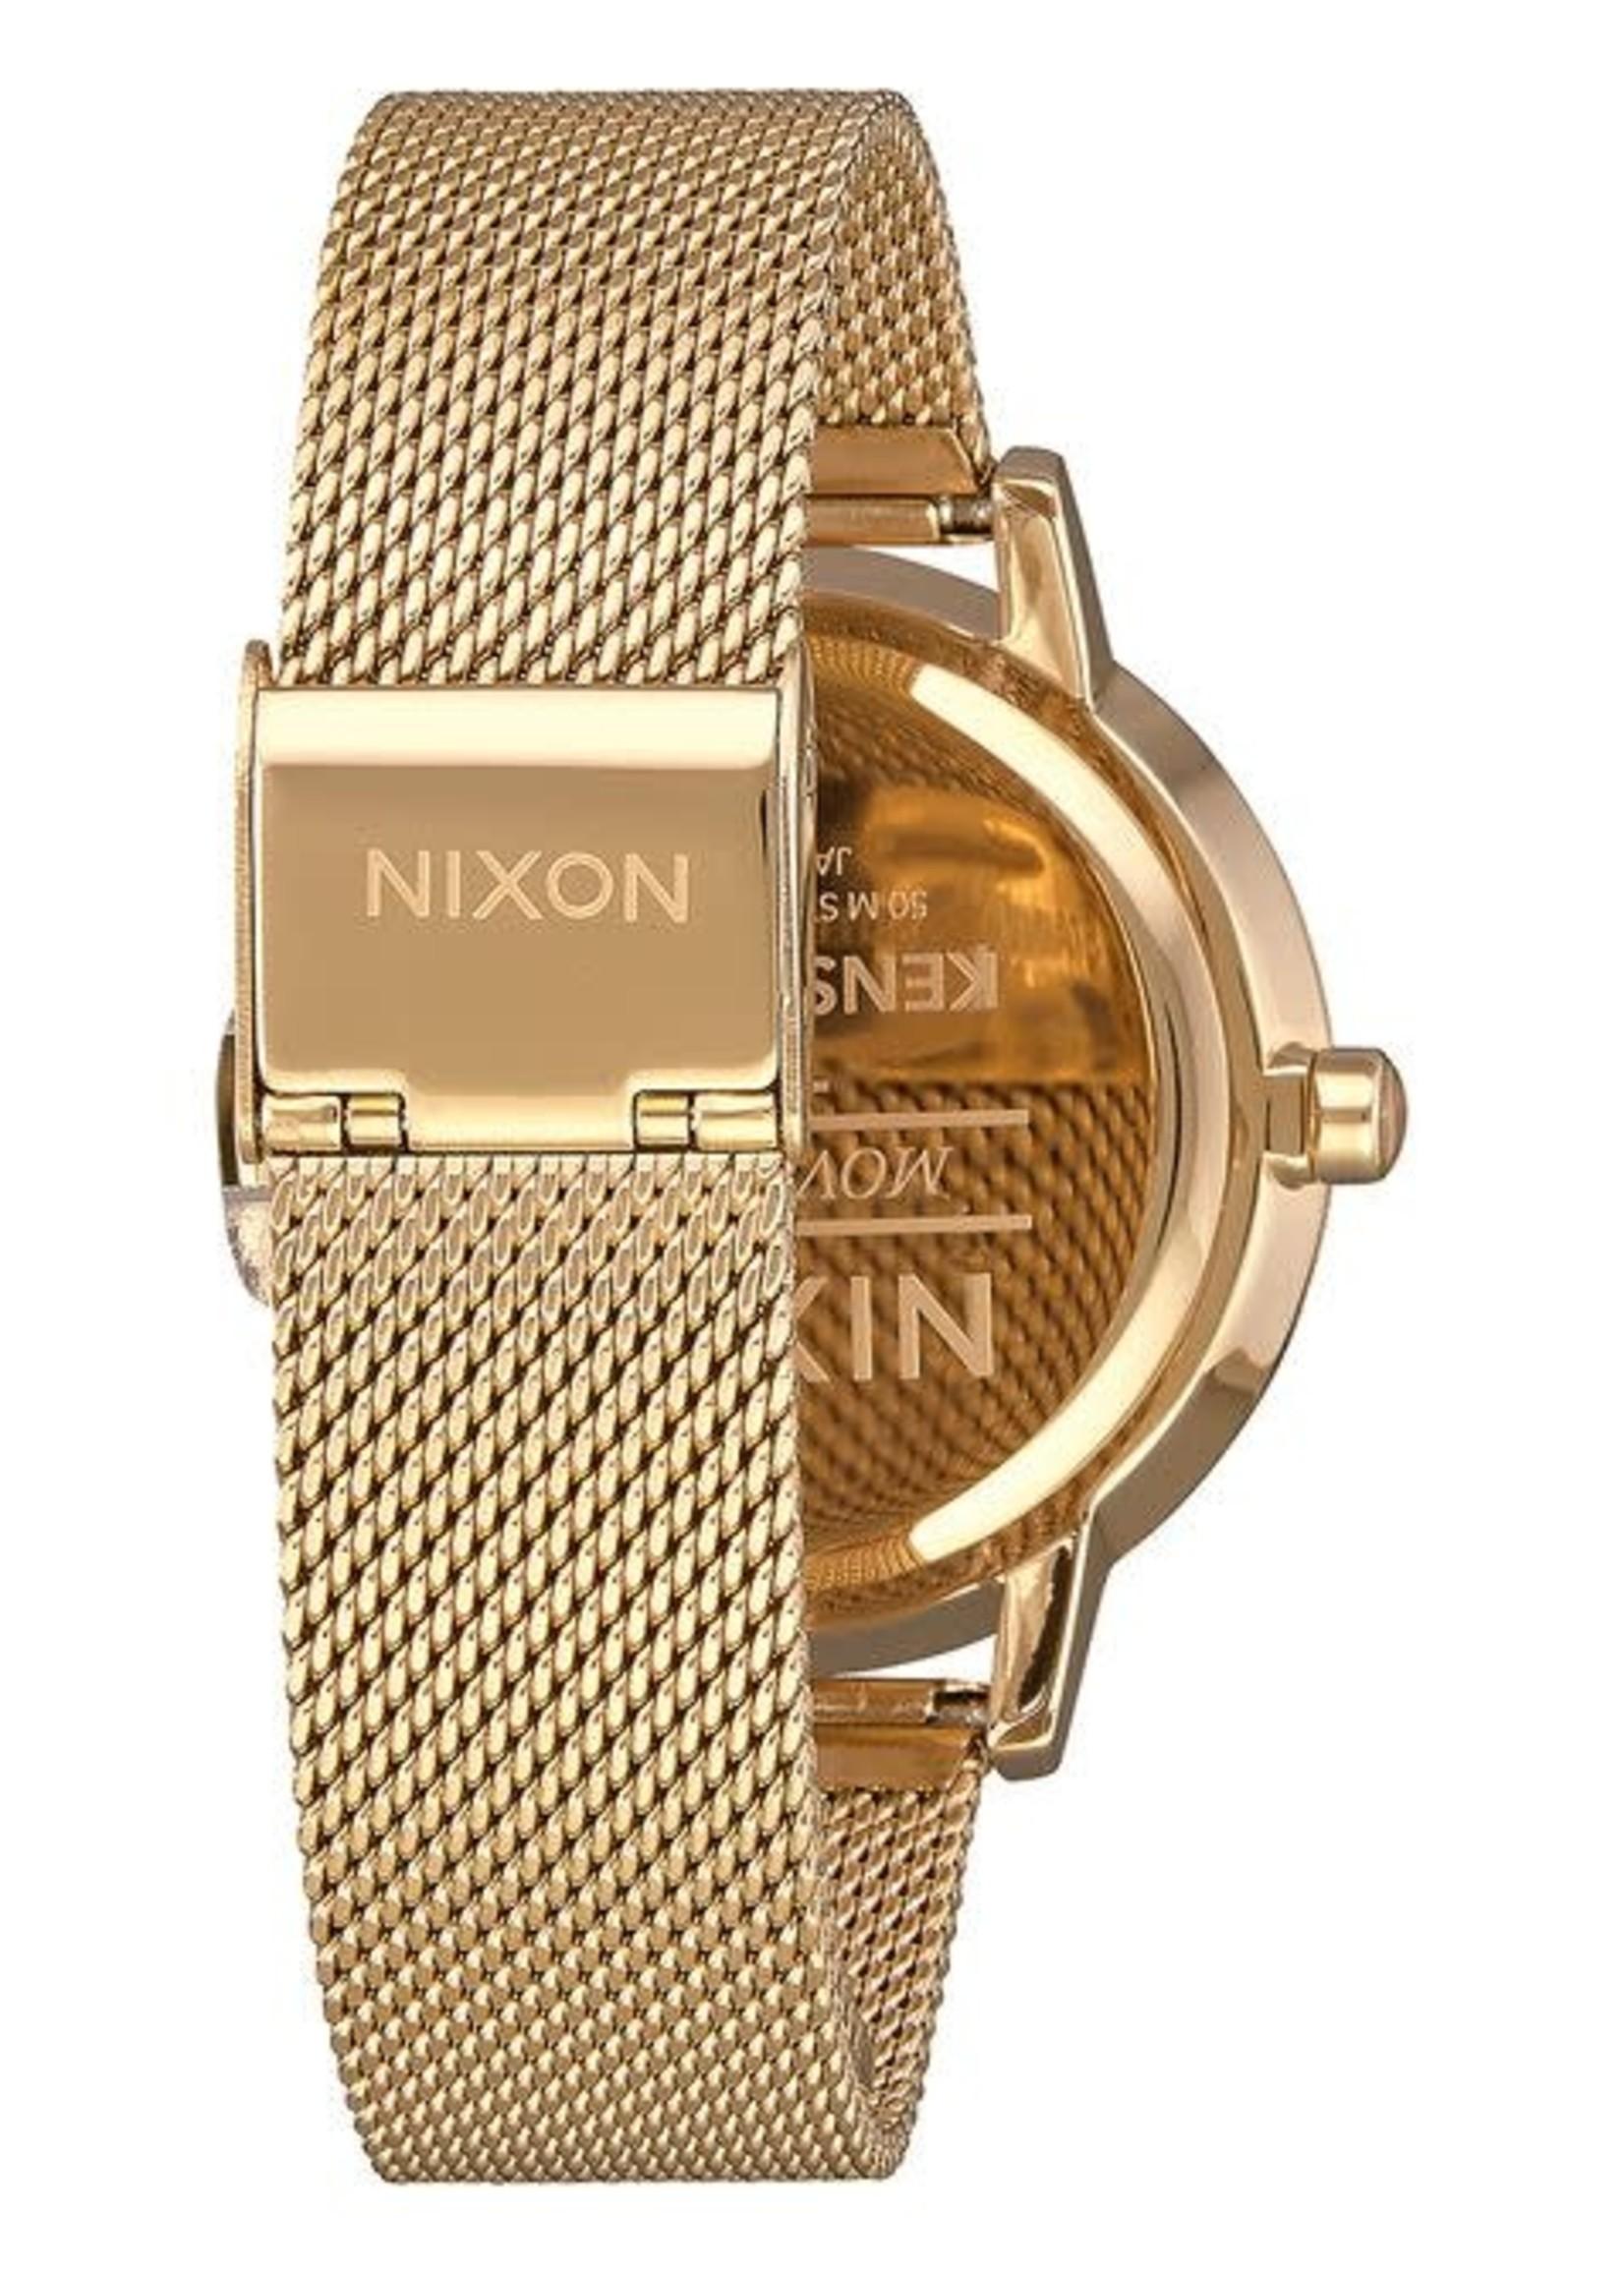 NIXON KENSINGTON Milanese, All Gold